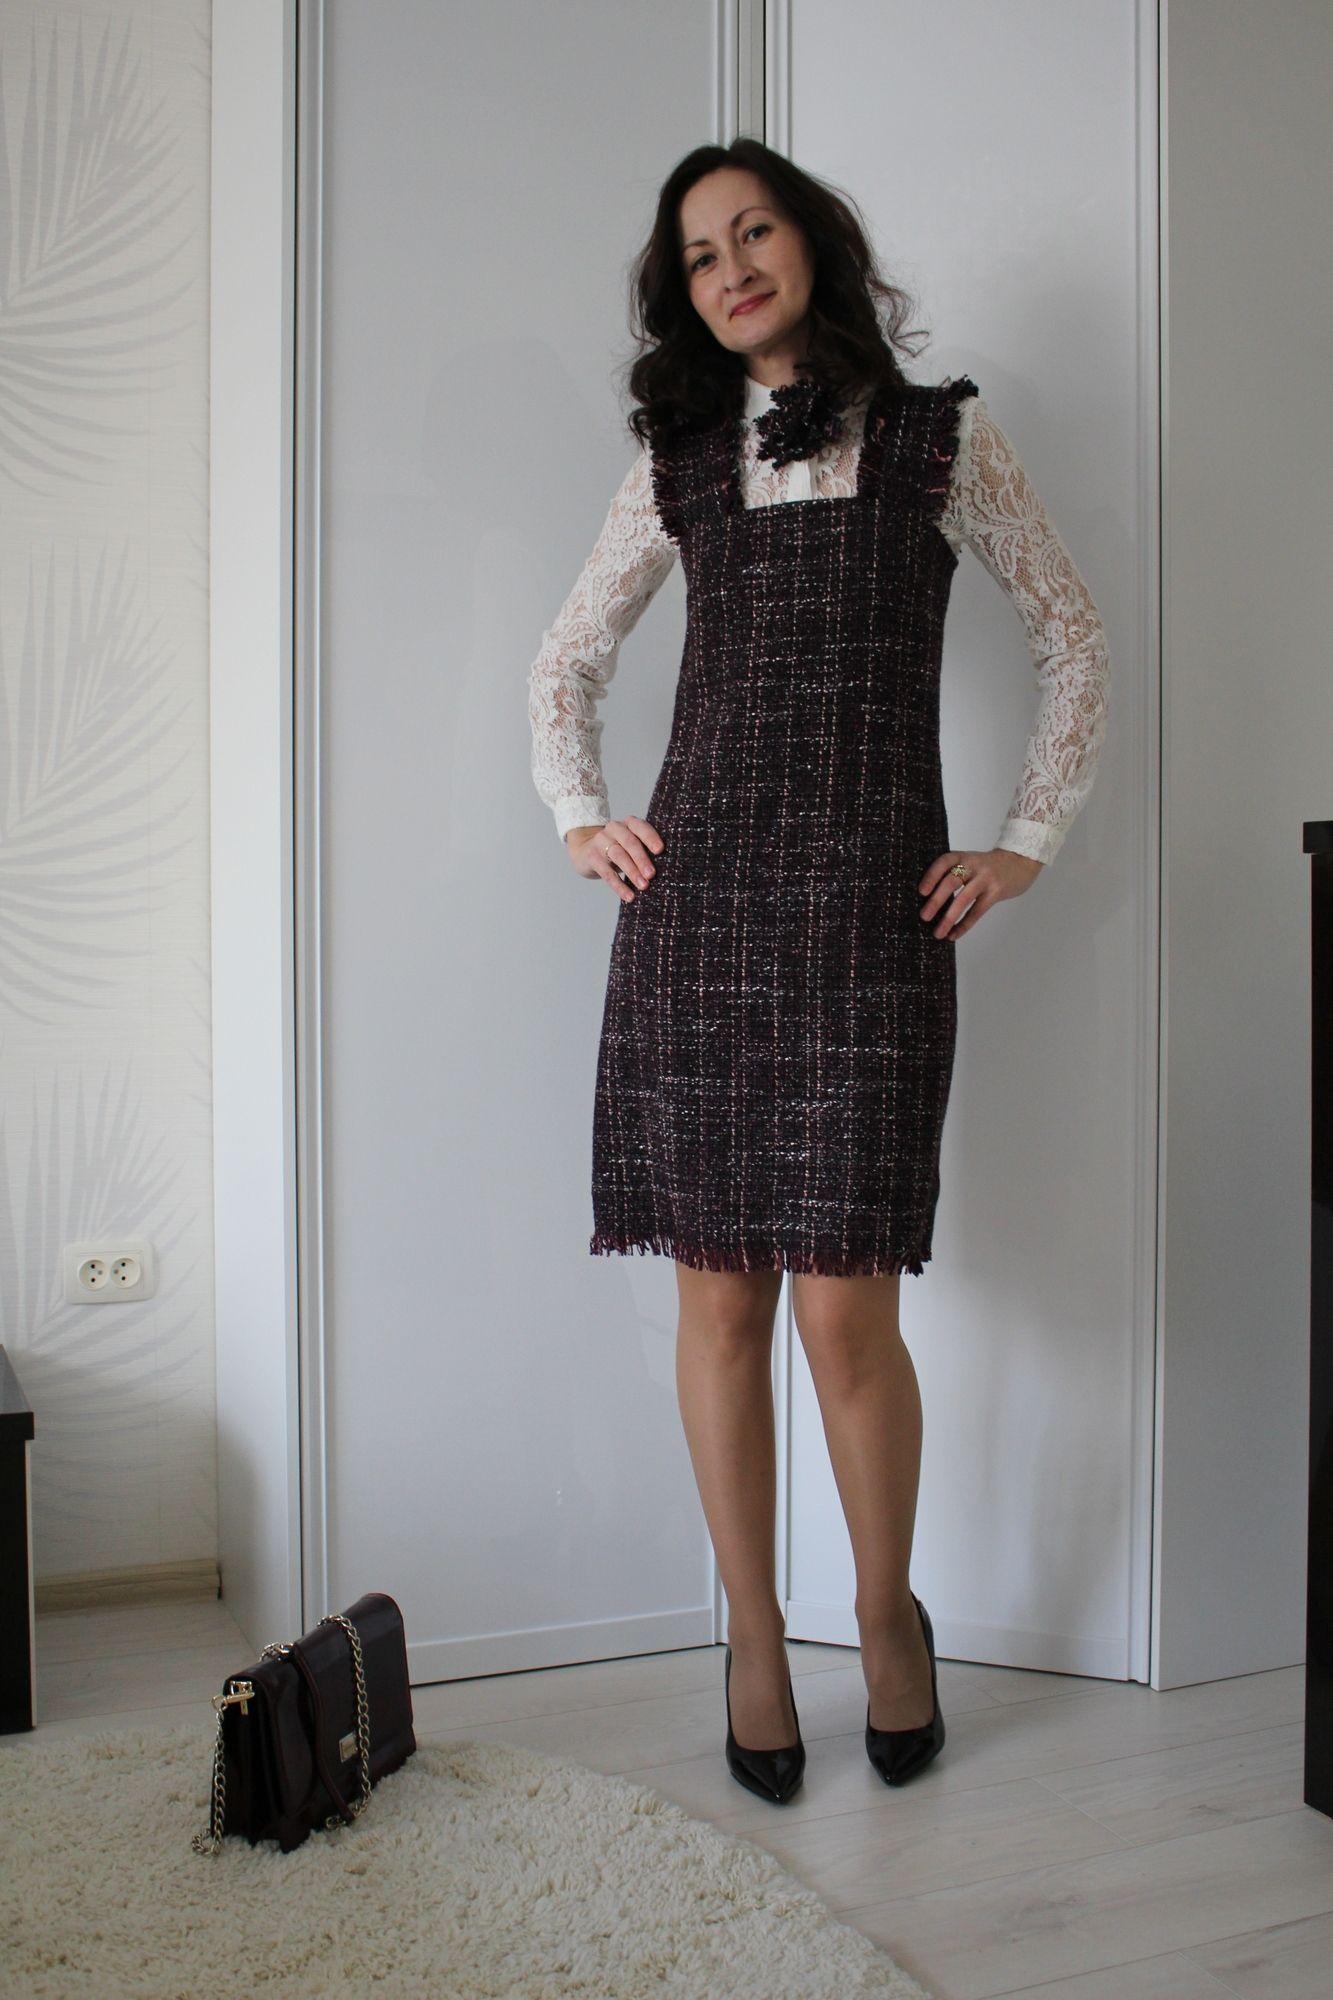 "Сарафан ""немного Шанель"" / Katerina77 / 22.12.2016 / Фотофорум BurdaStyle"